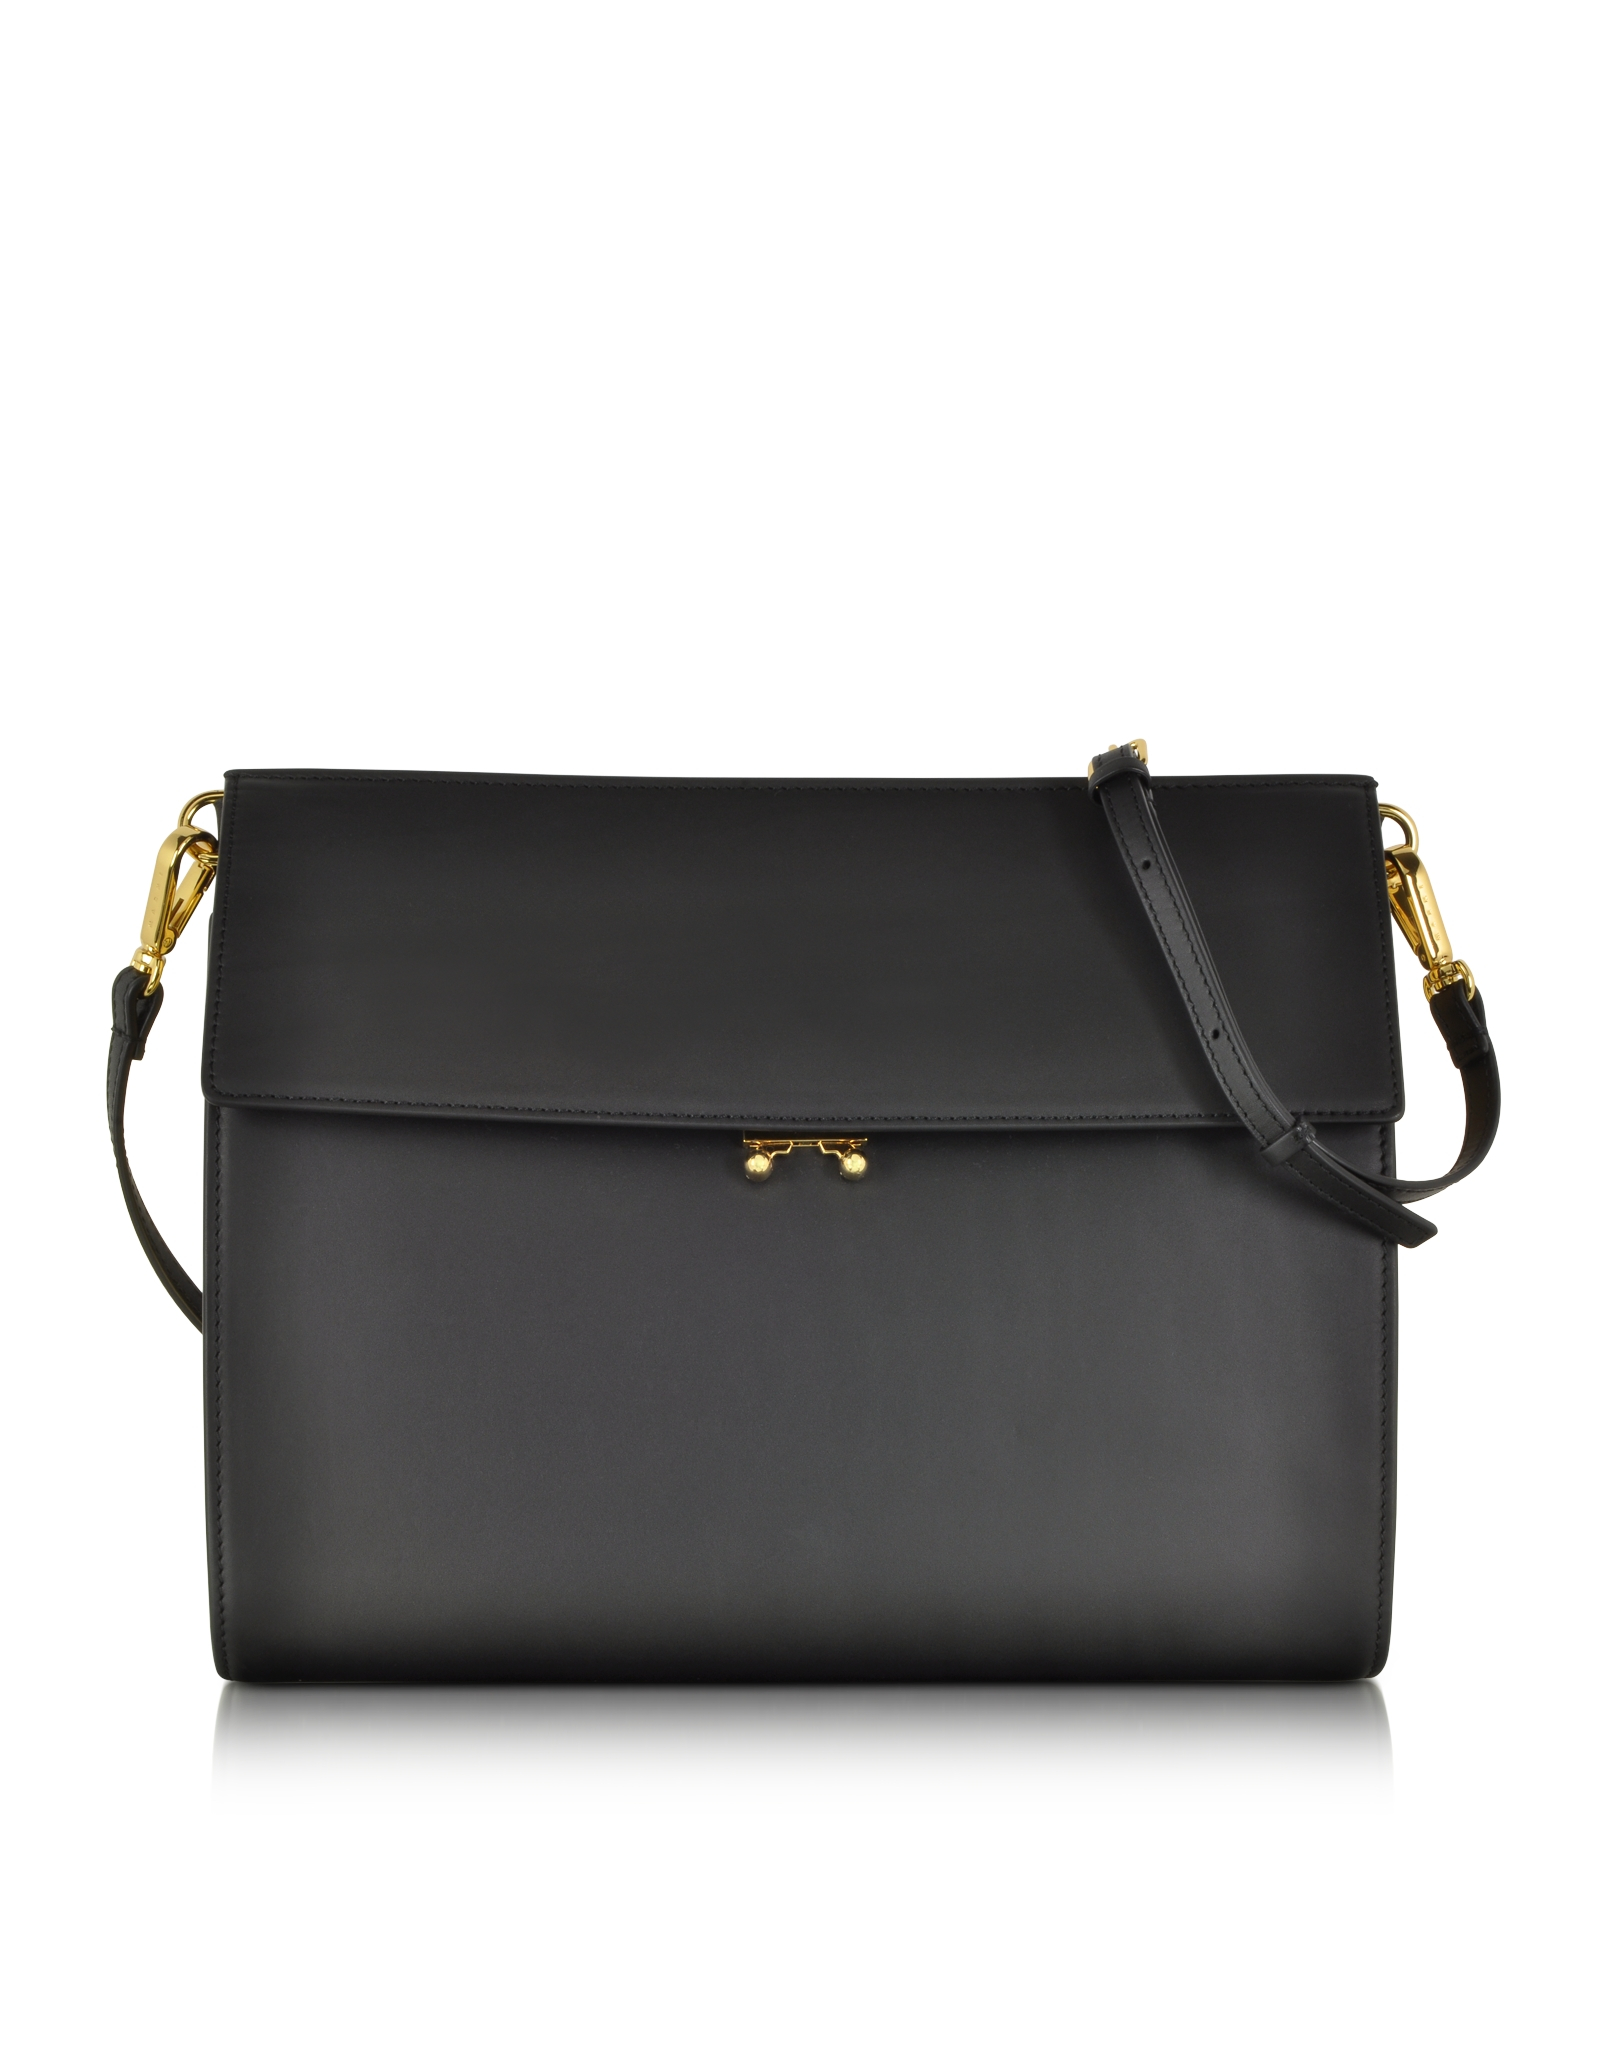 Carbon Black Metallic: Marni File Bag Carbon Black Leather Large Pochette